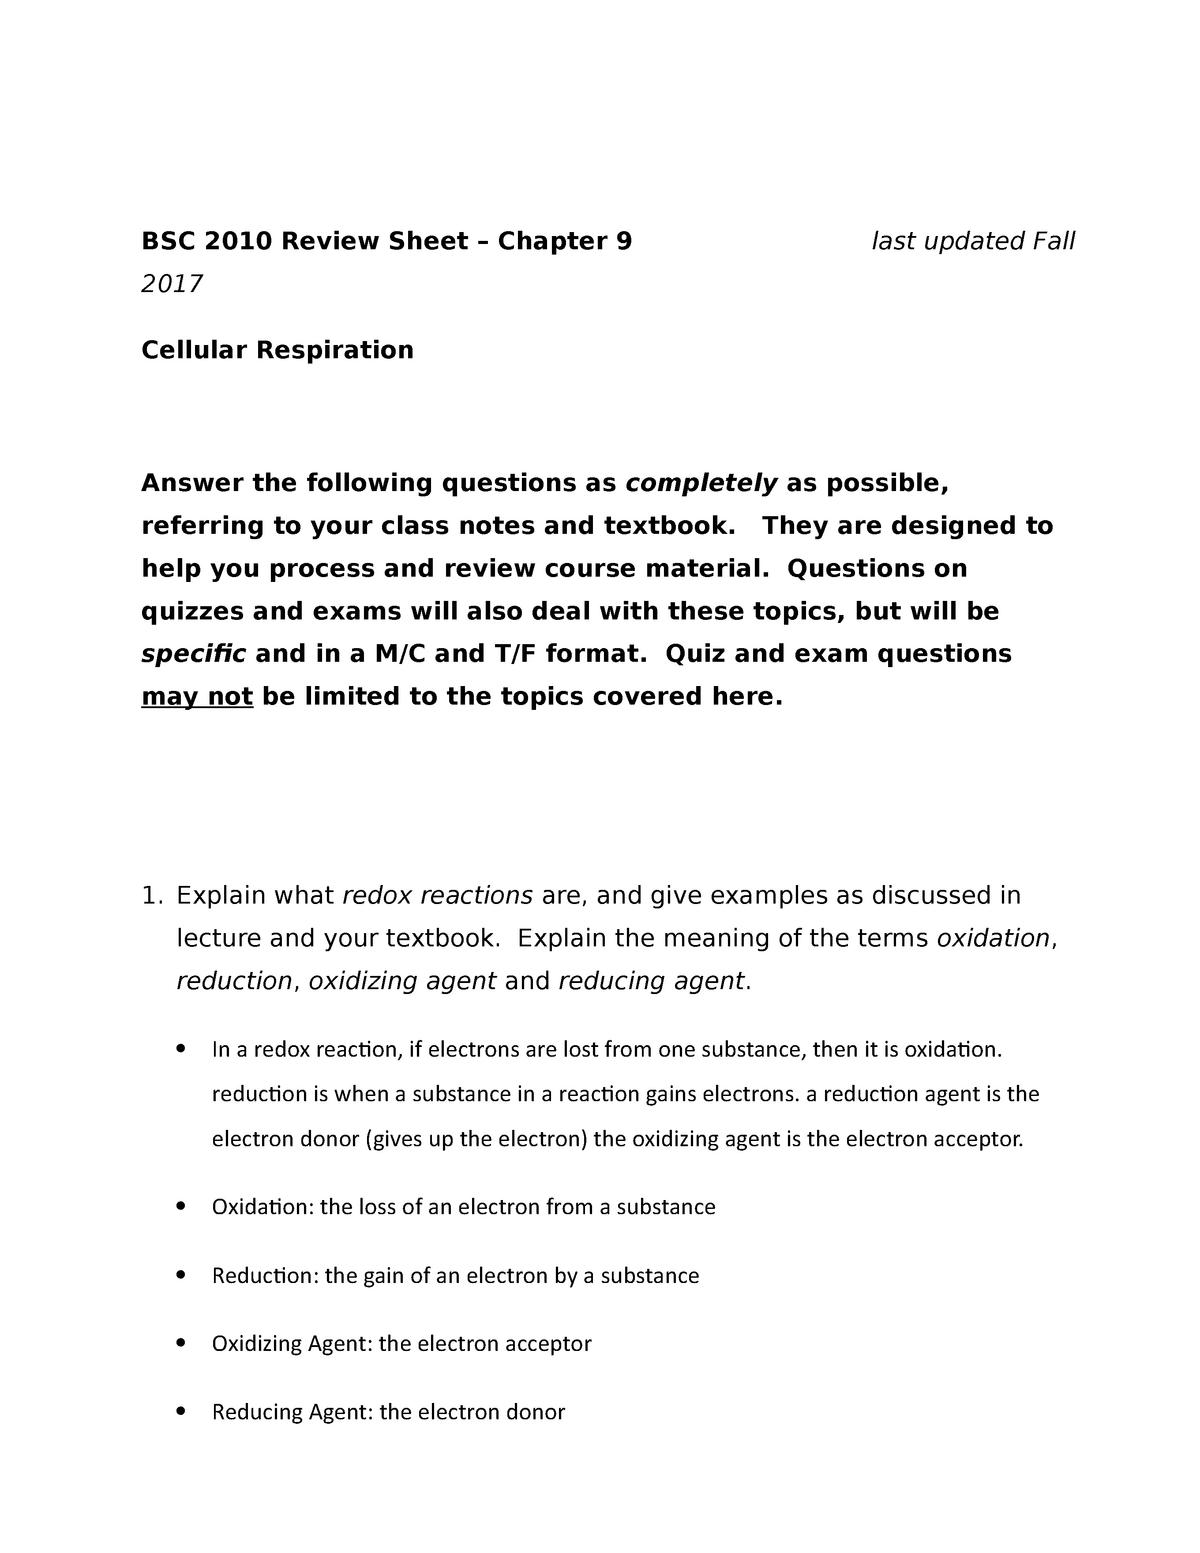 EXAM 3 Chapter 9 Fall 2017 - BSC2010 Cellular Processes - StuDocu